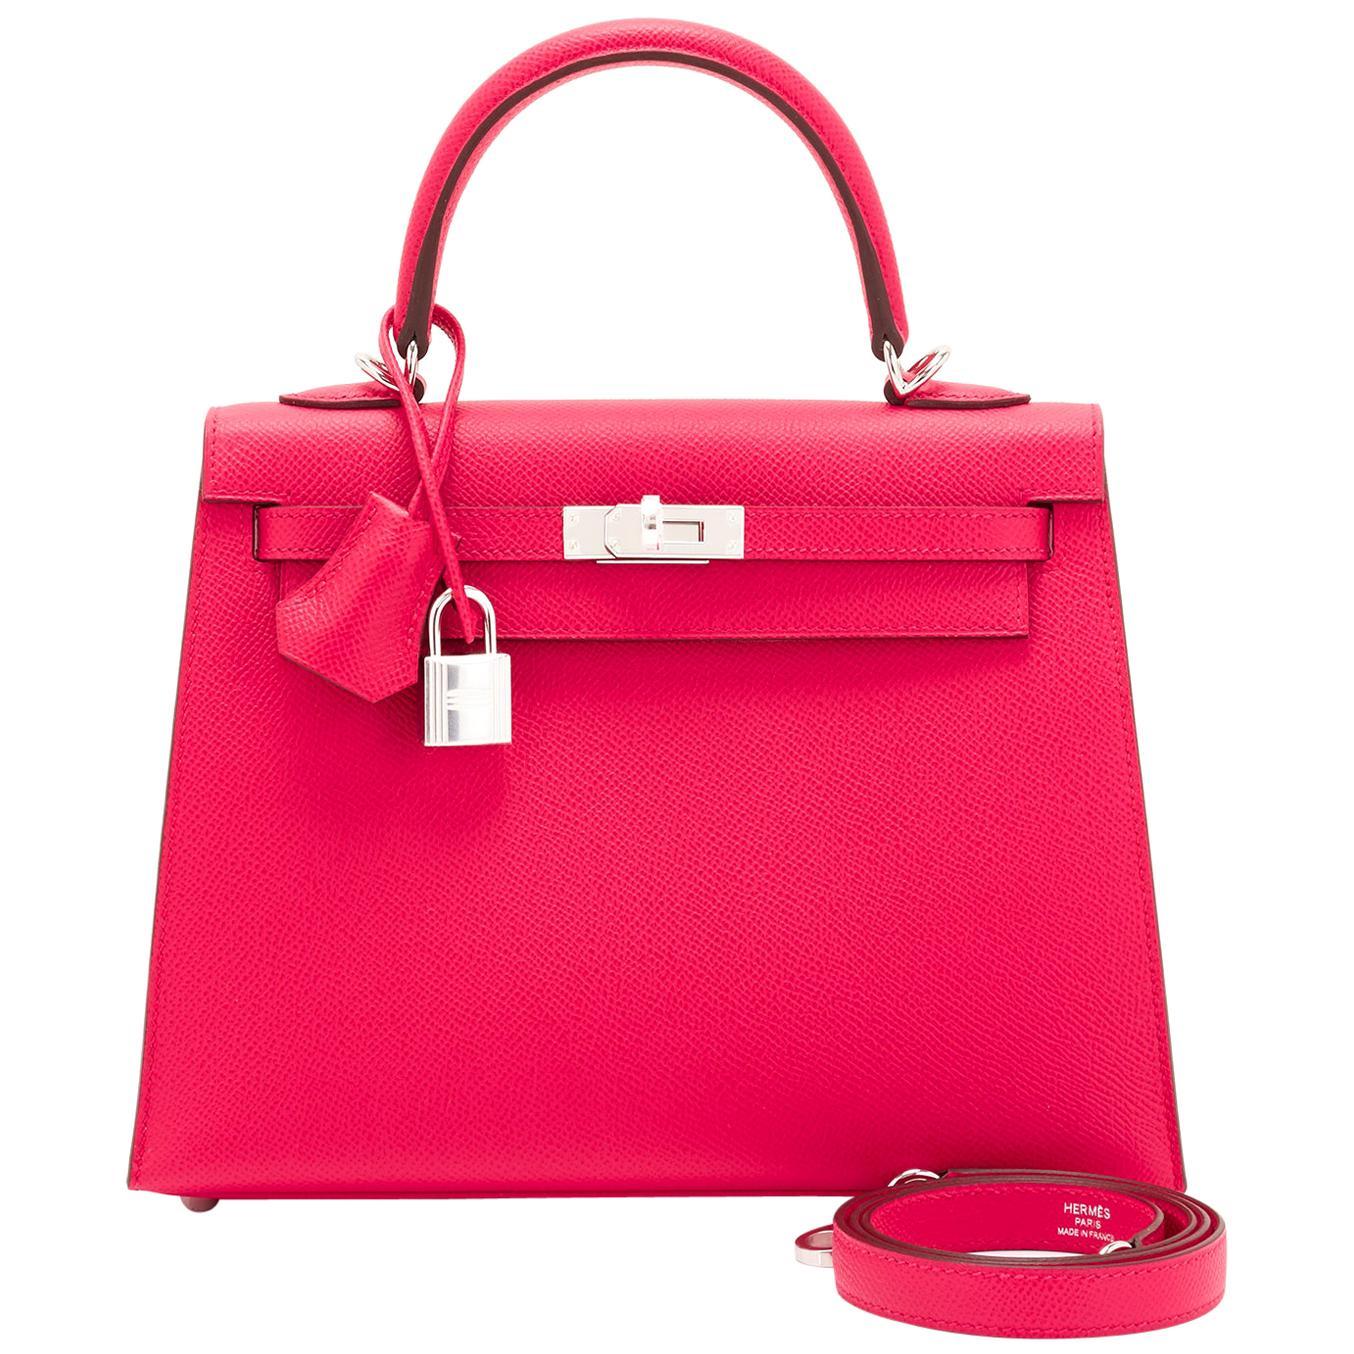 Hermes Kelly 25 Rose Extreme Pink Epsom Sellier Bag Palladium Y Stamp, 2020